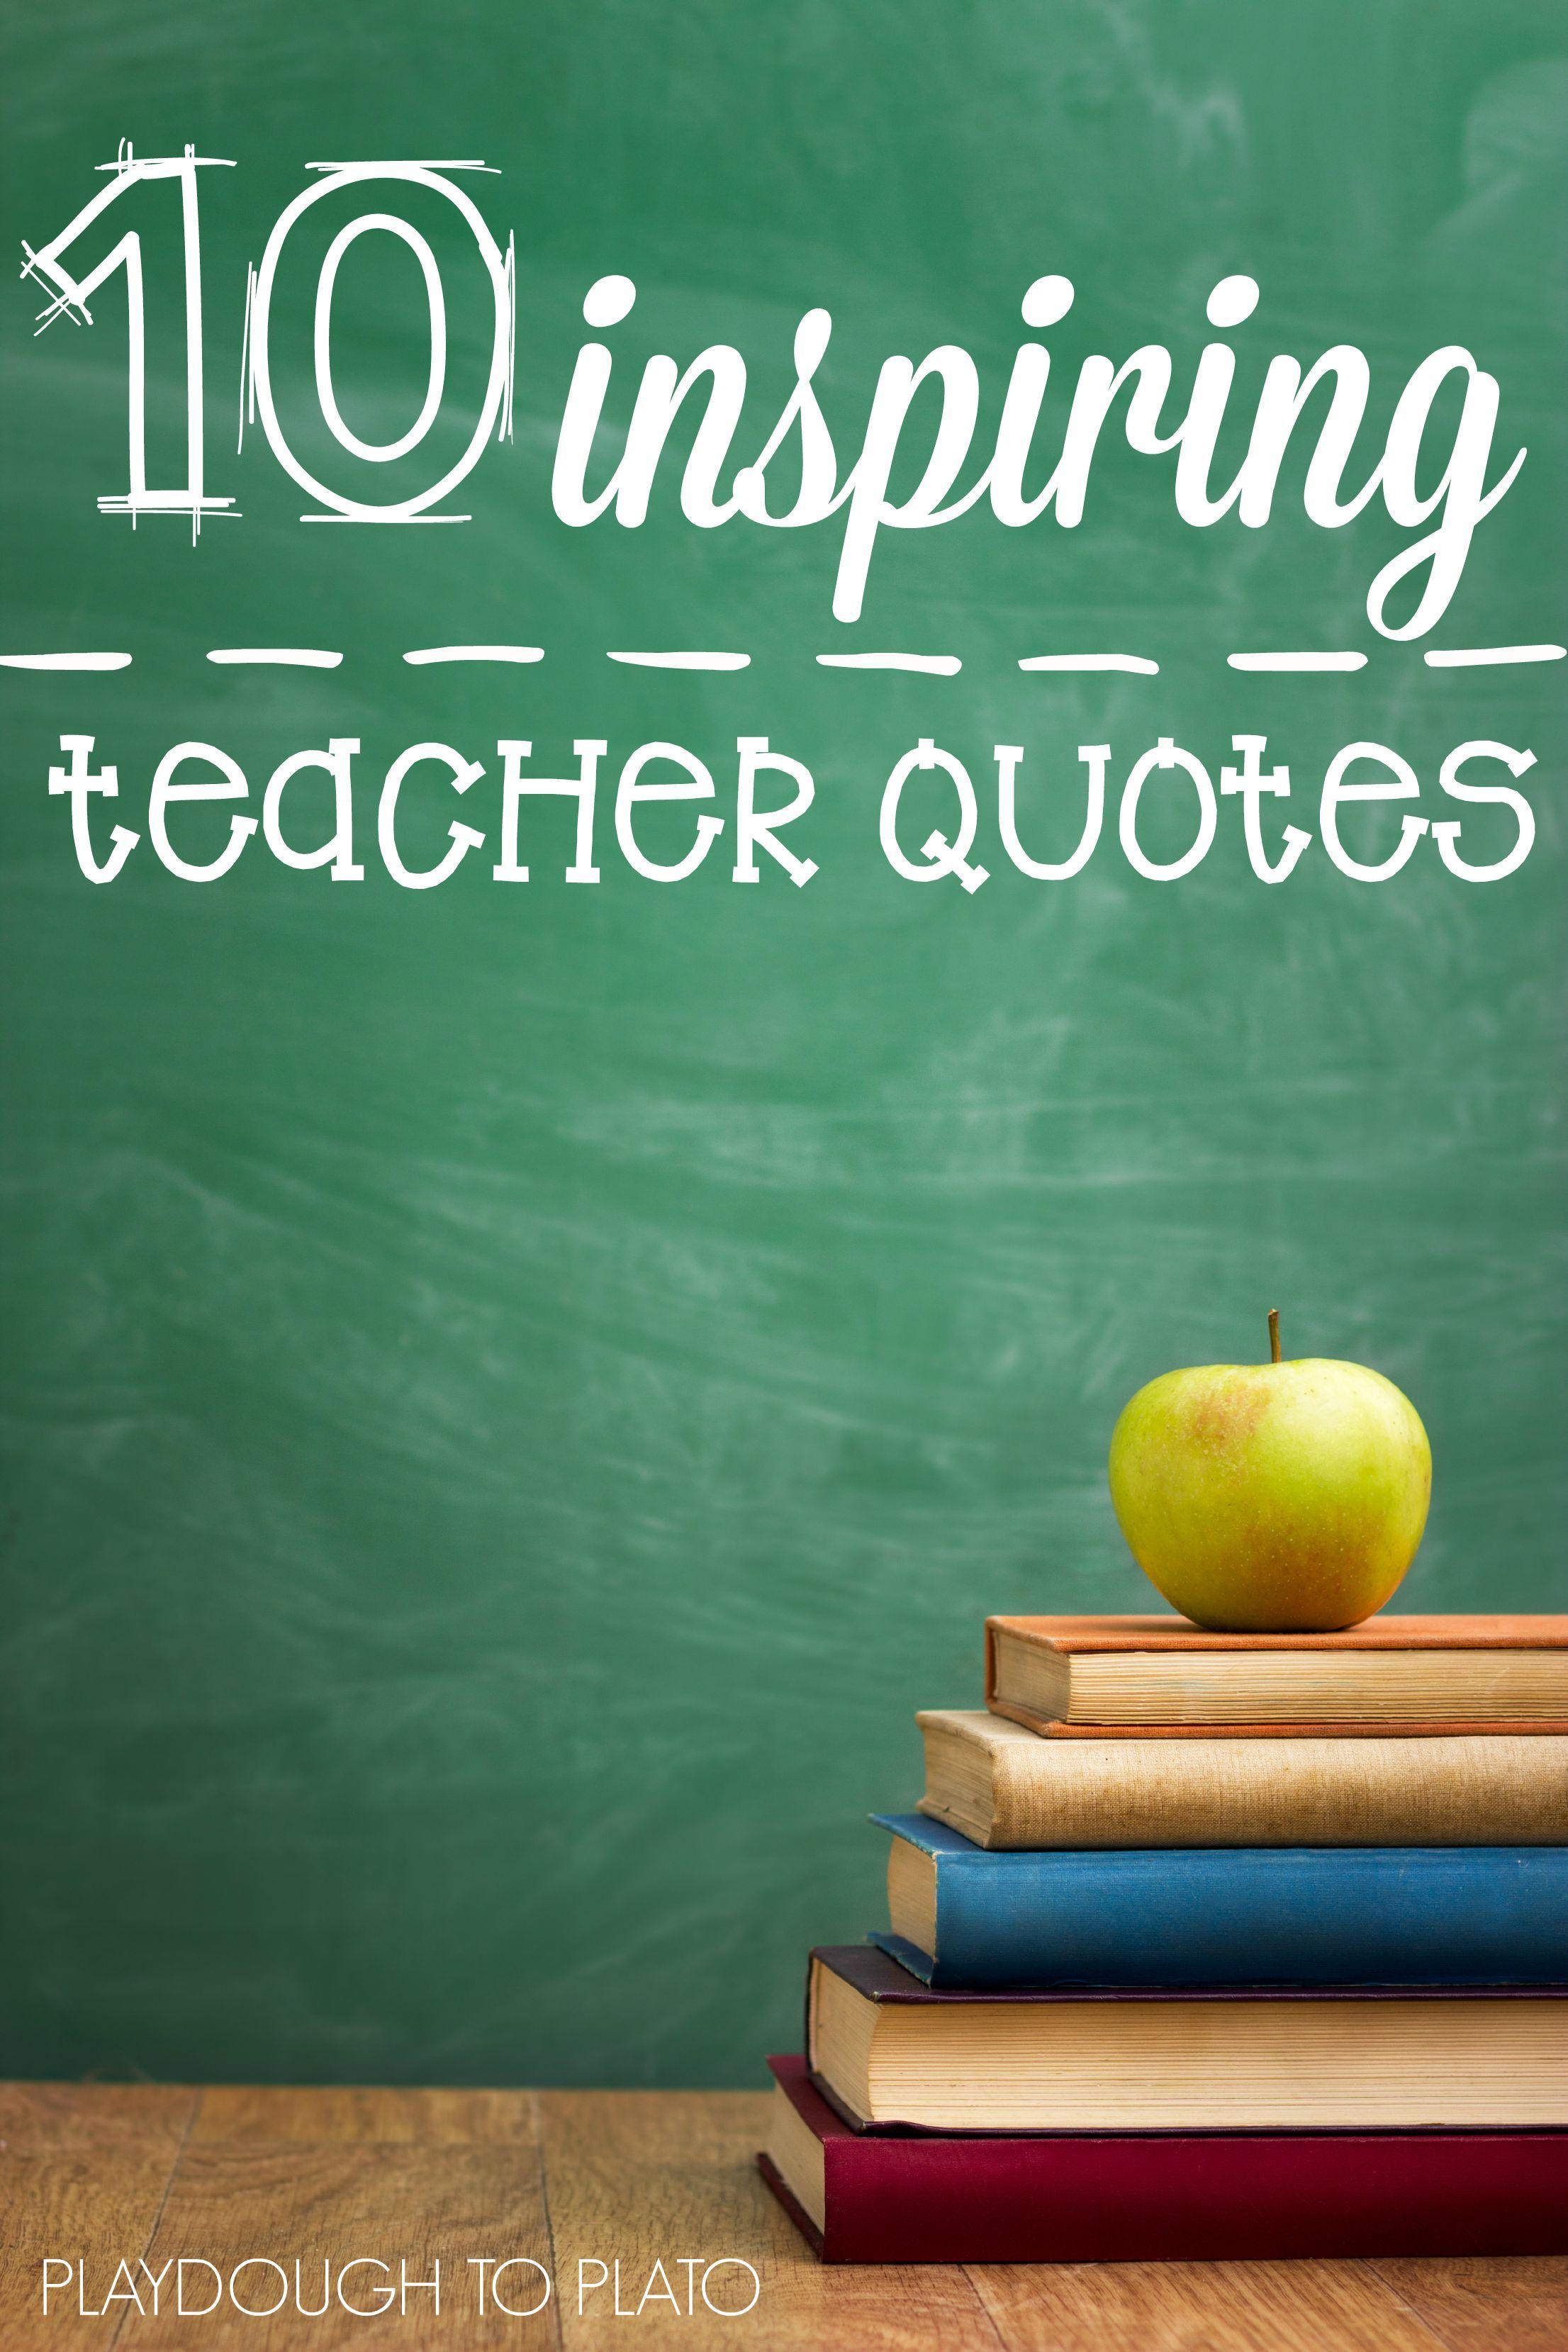 Educational Inspirational Quotes 10 Inspiring Teacher Quotes  Teacher And School